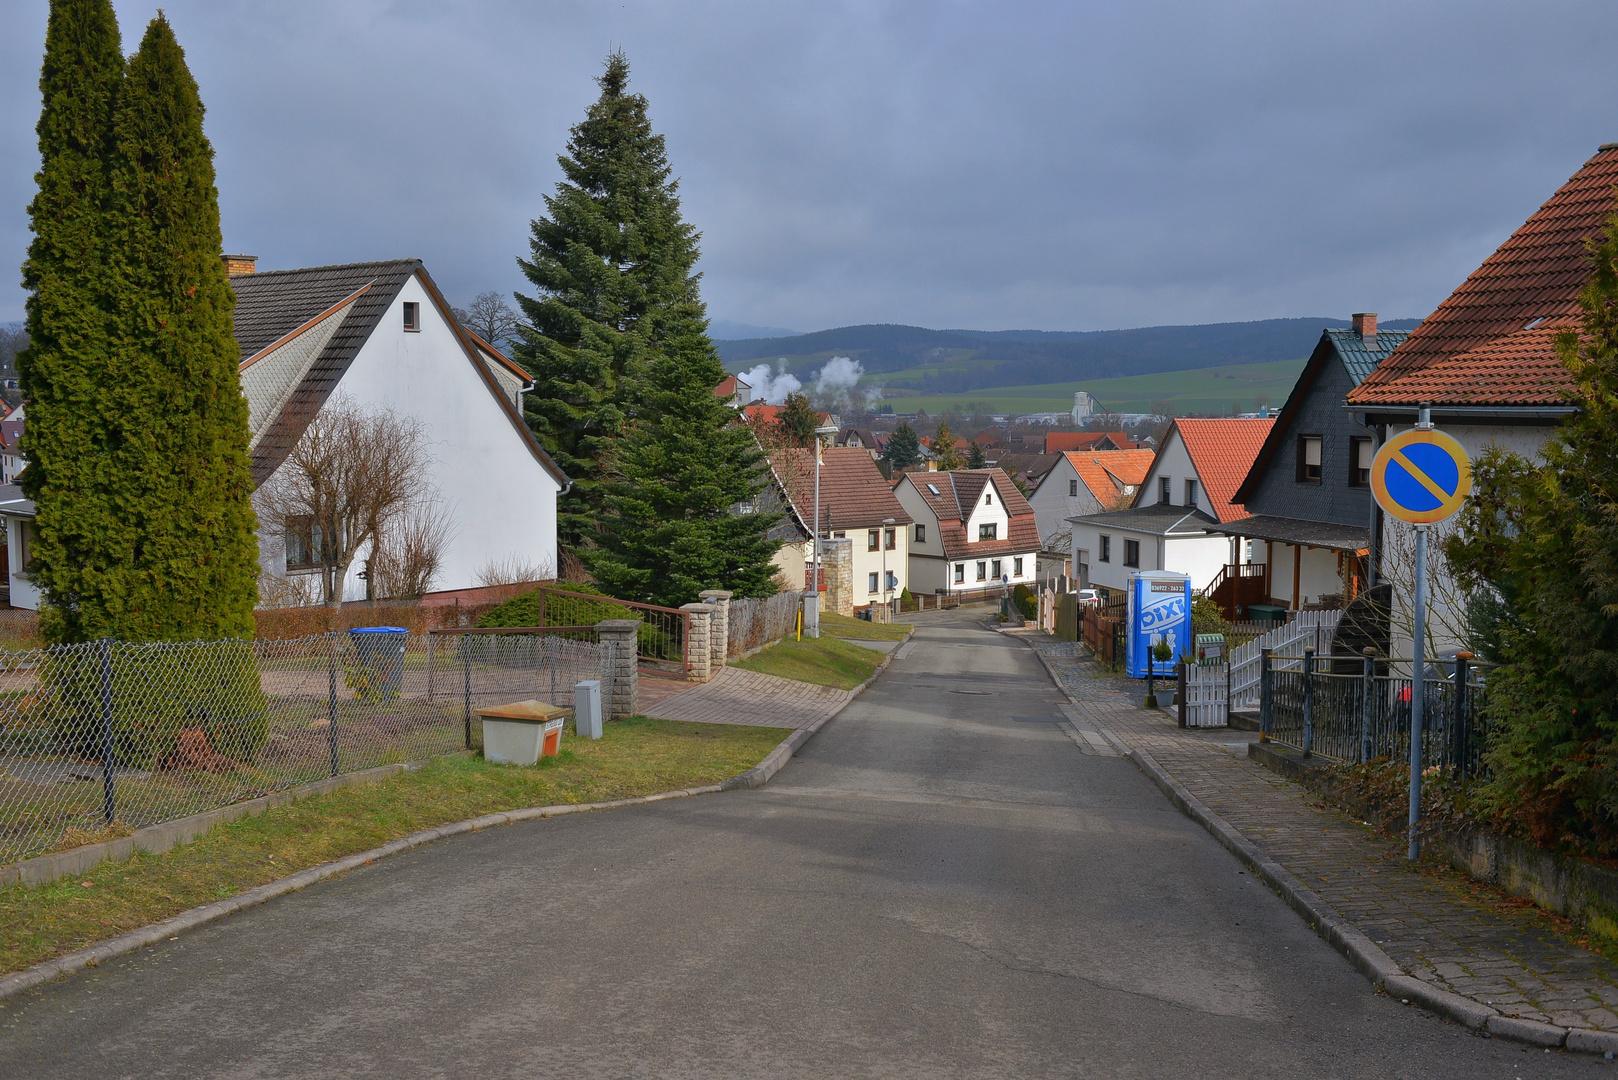 Spaziergang durch Wernshausen, 3 (paseando por Wernshausen)